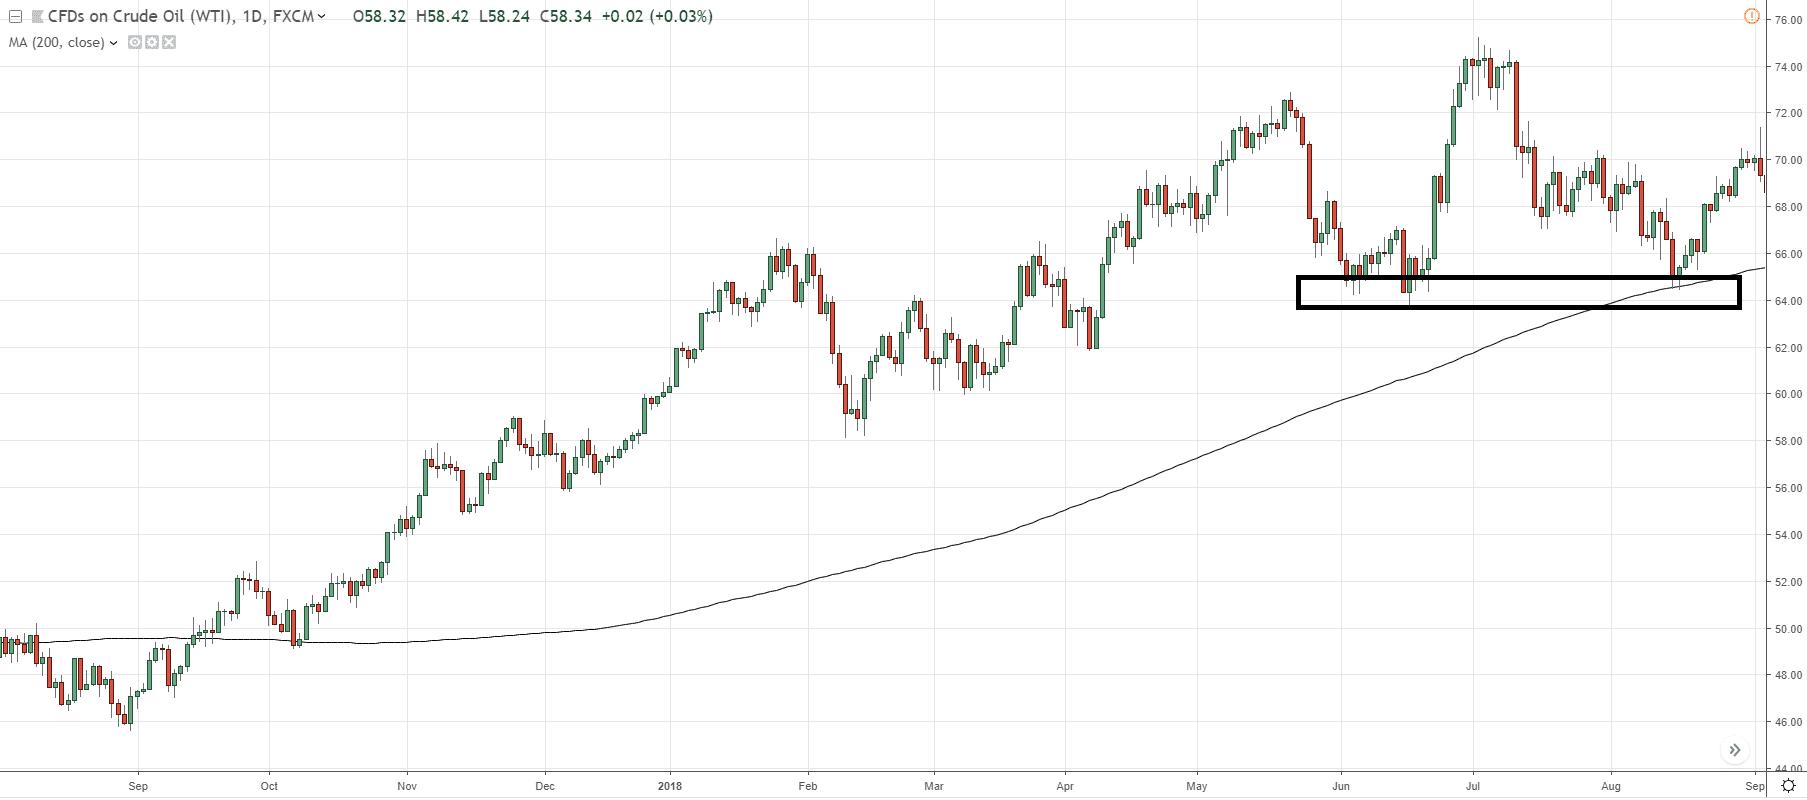 The Ultimate Trading Indicators Webinar